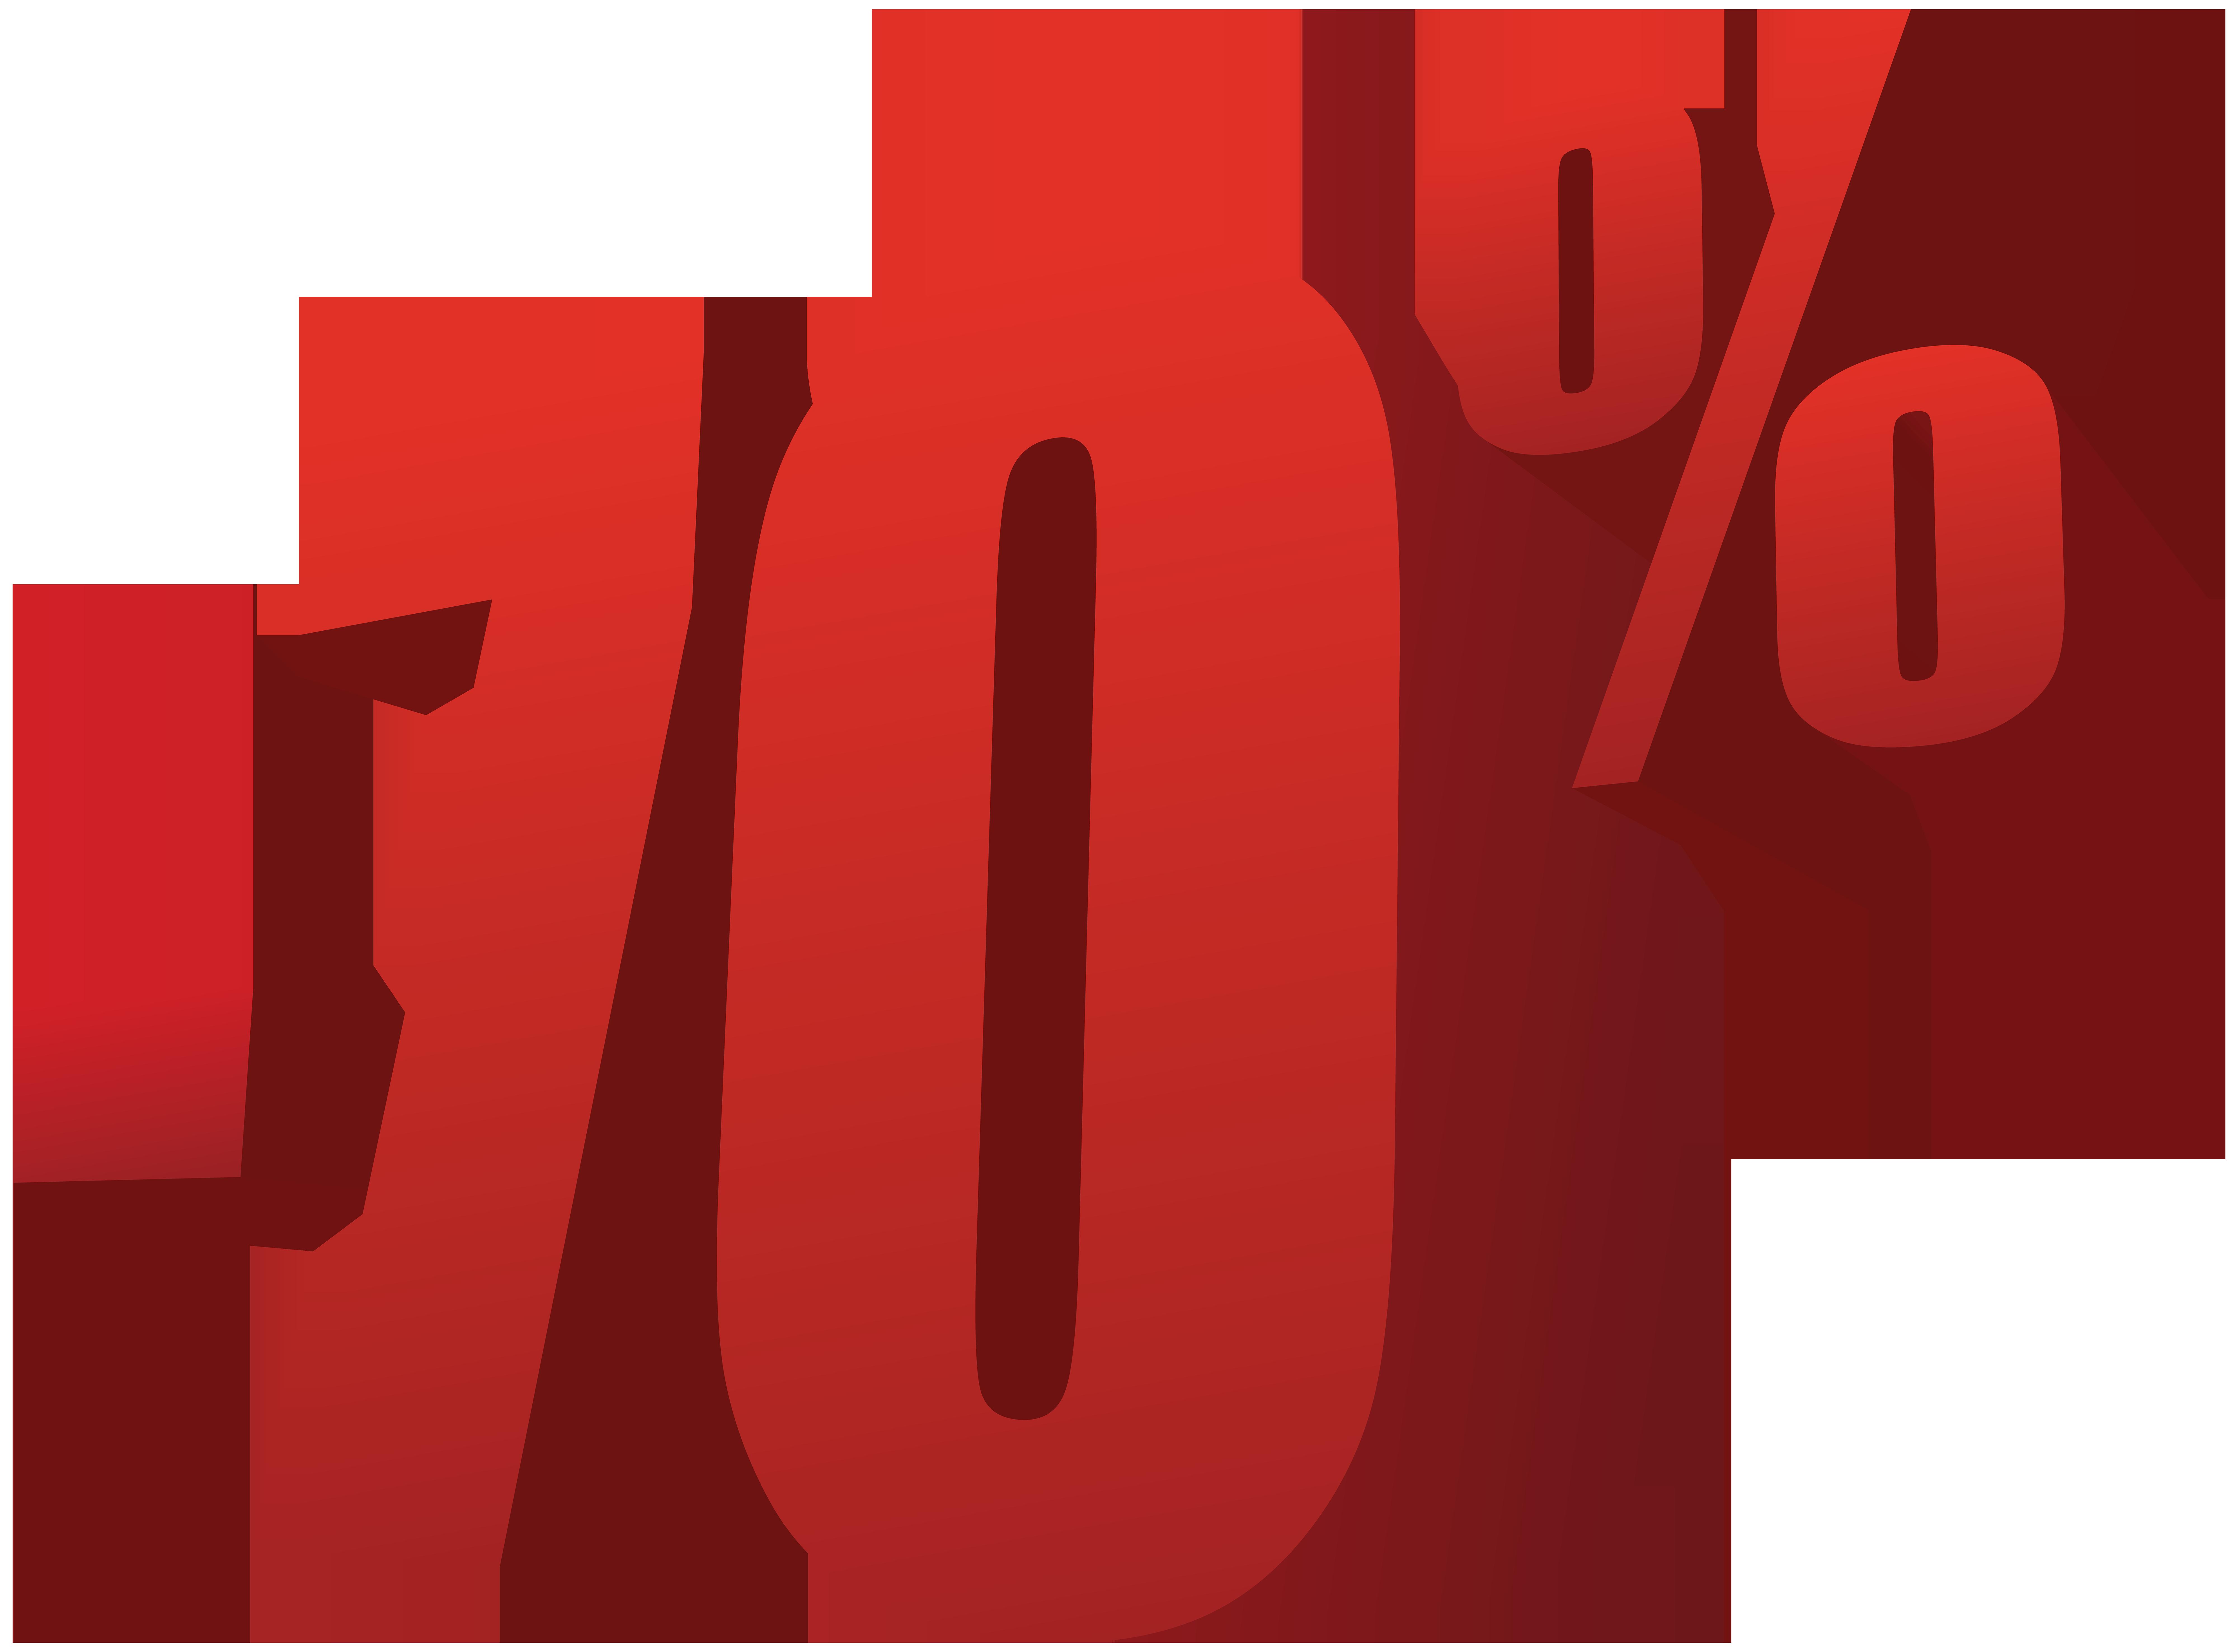 70% Off Sale PNG Transparent Image.